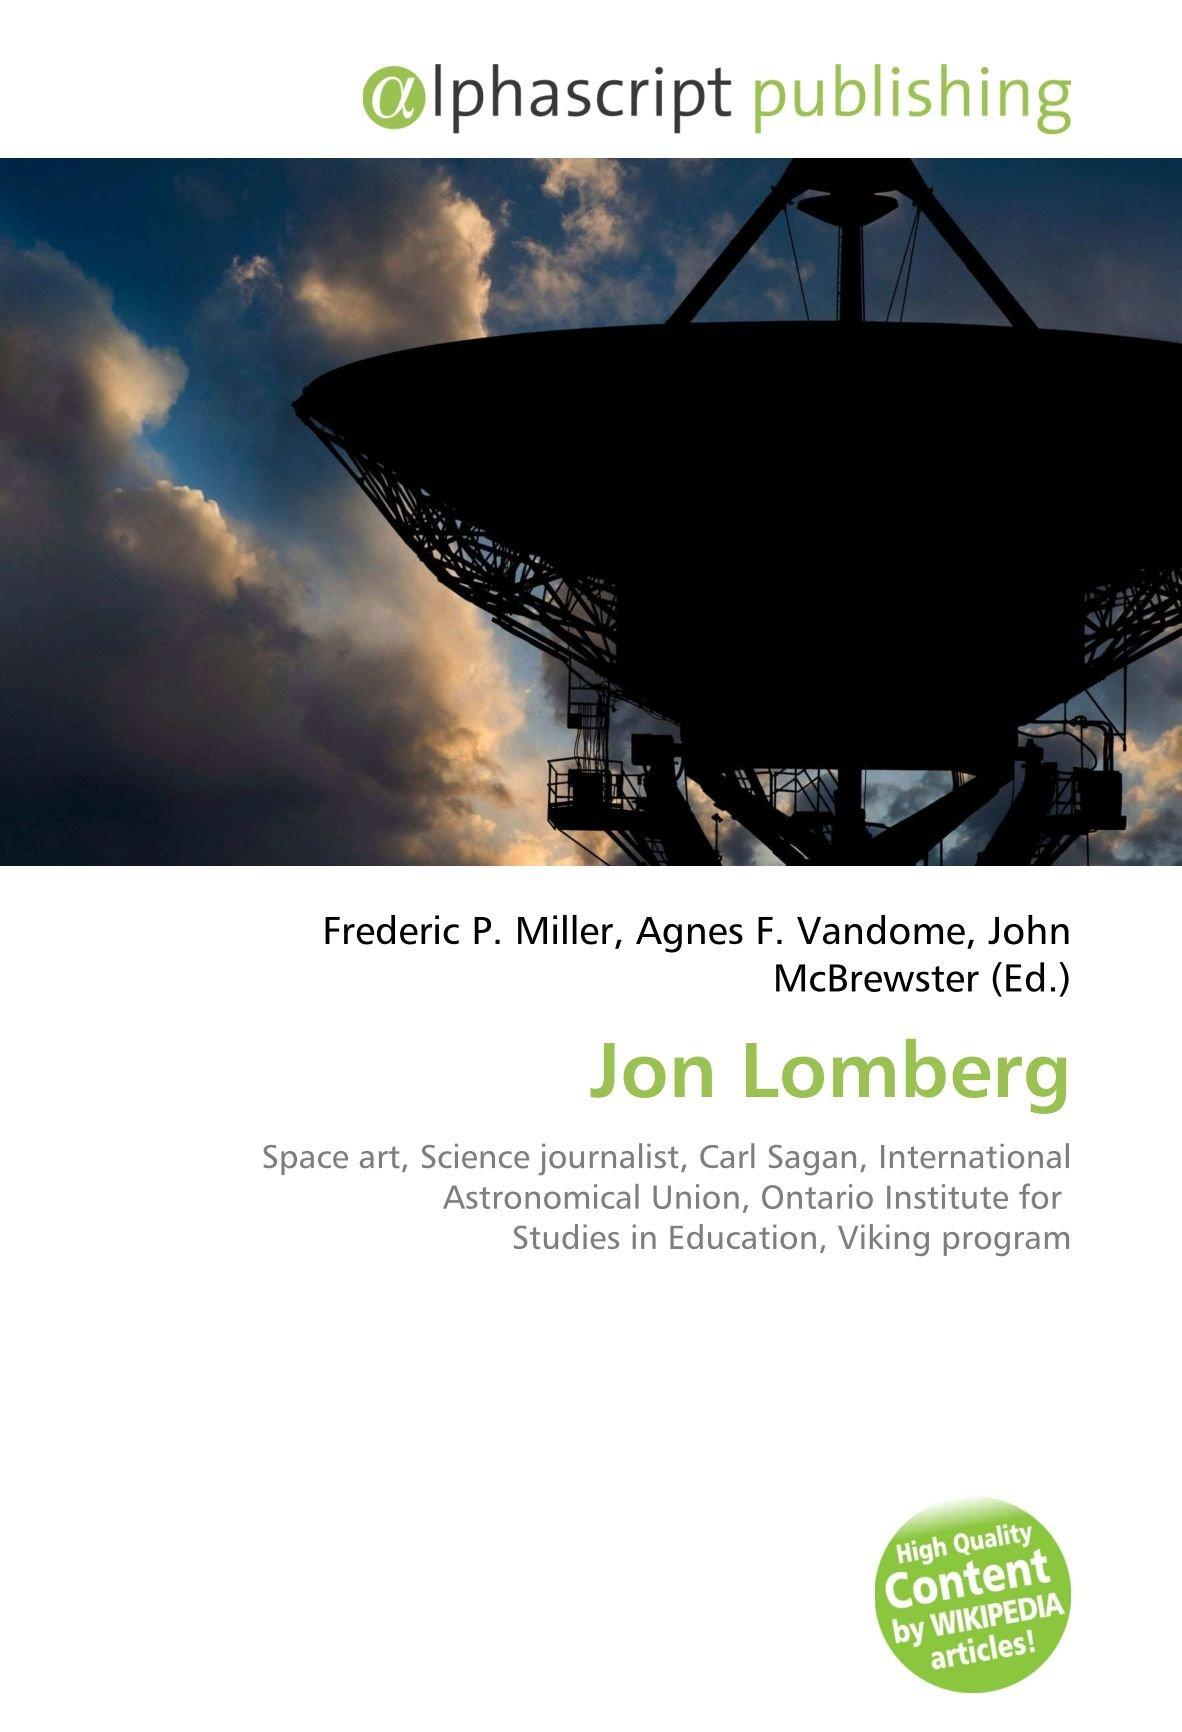 Jon Lomberg: Amazon.es: Miller, Frederic P., Vandome, Agnes F., McBrewster, John: Libros en idiomas extranjeros